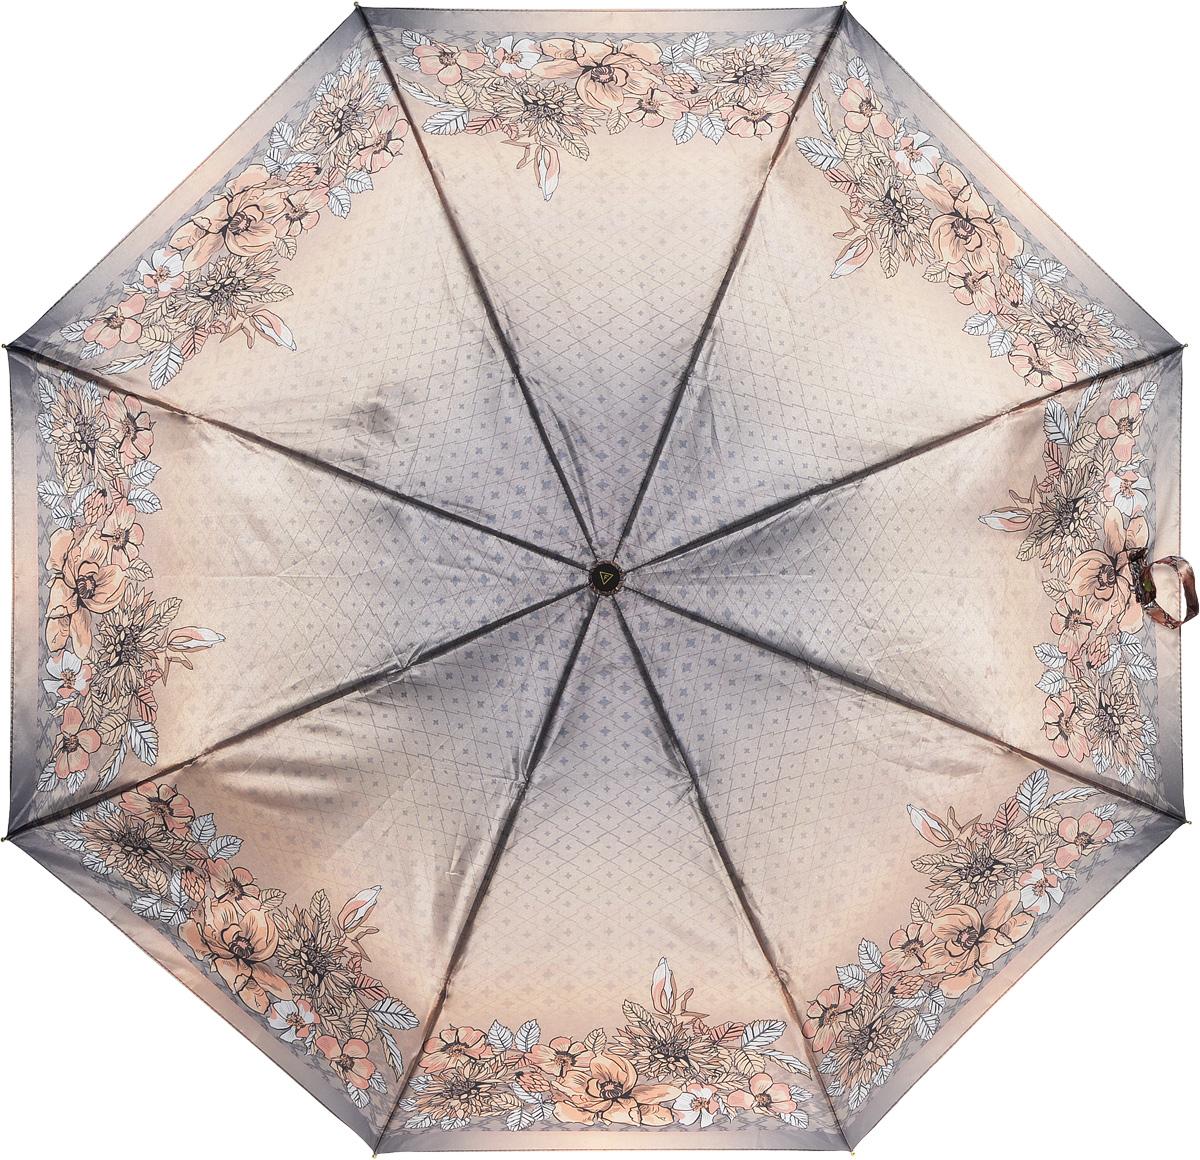 Зонт женский Fabretti, автомат, 3 сложения. L-16107-23L-16107-23Зонт женский Fabretti, облегченный суперавтомат, 3 сложения